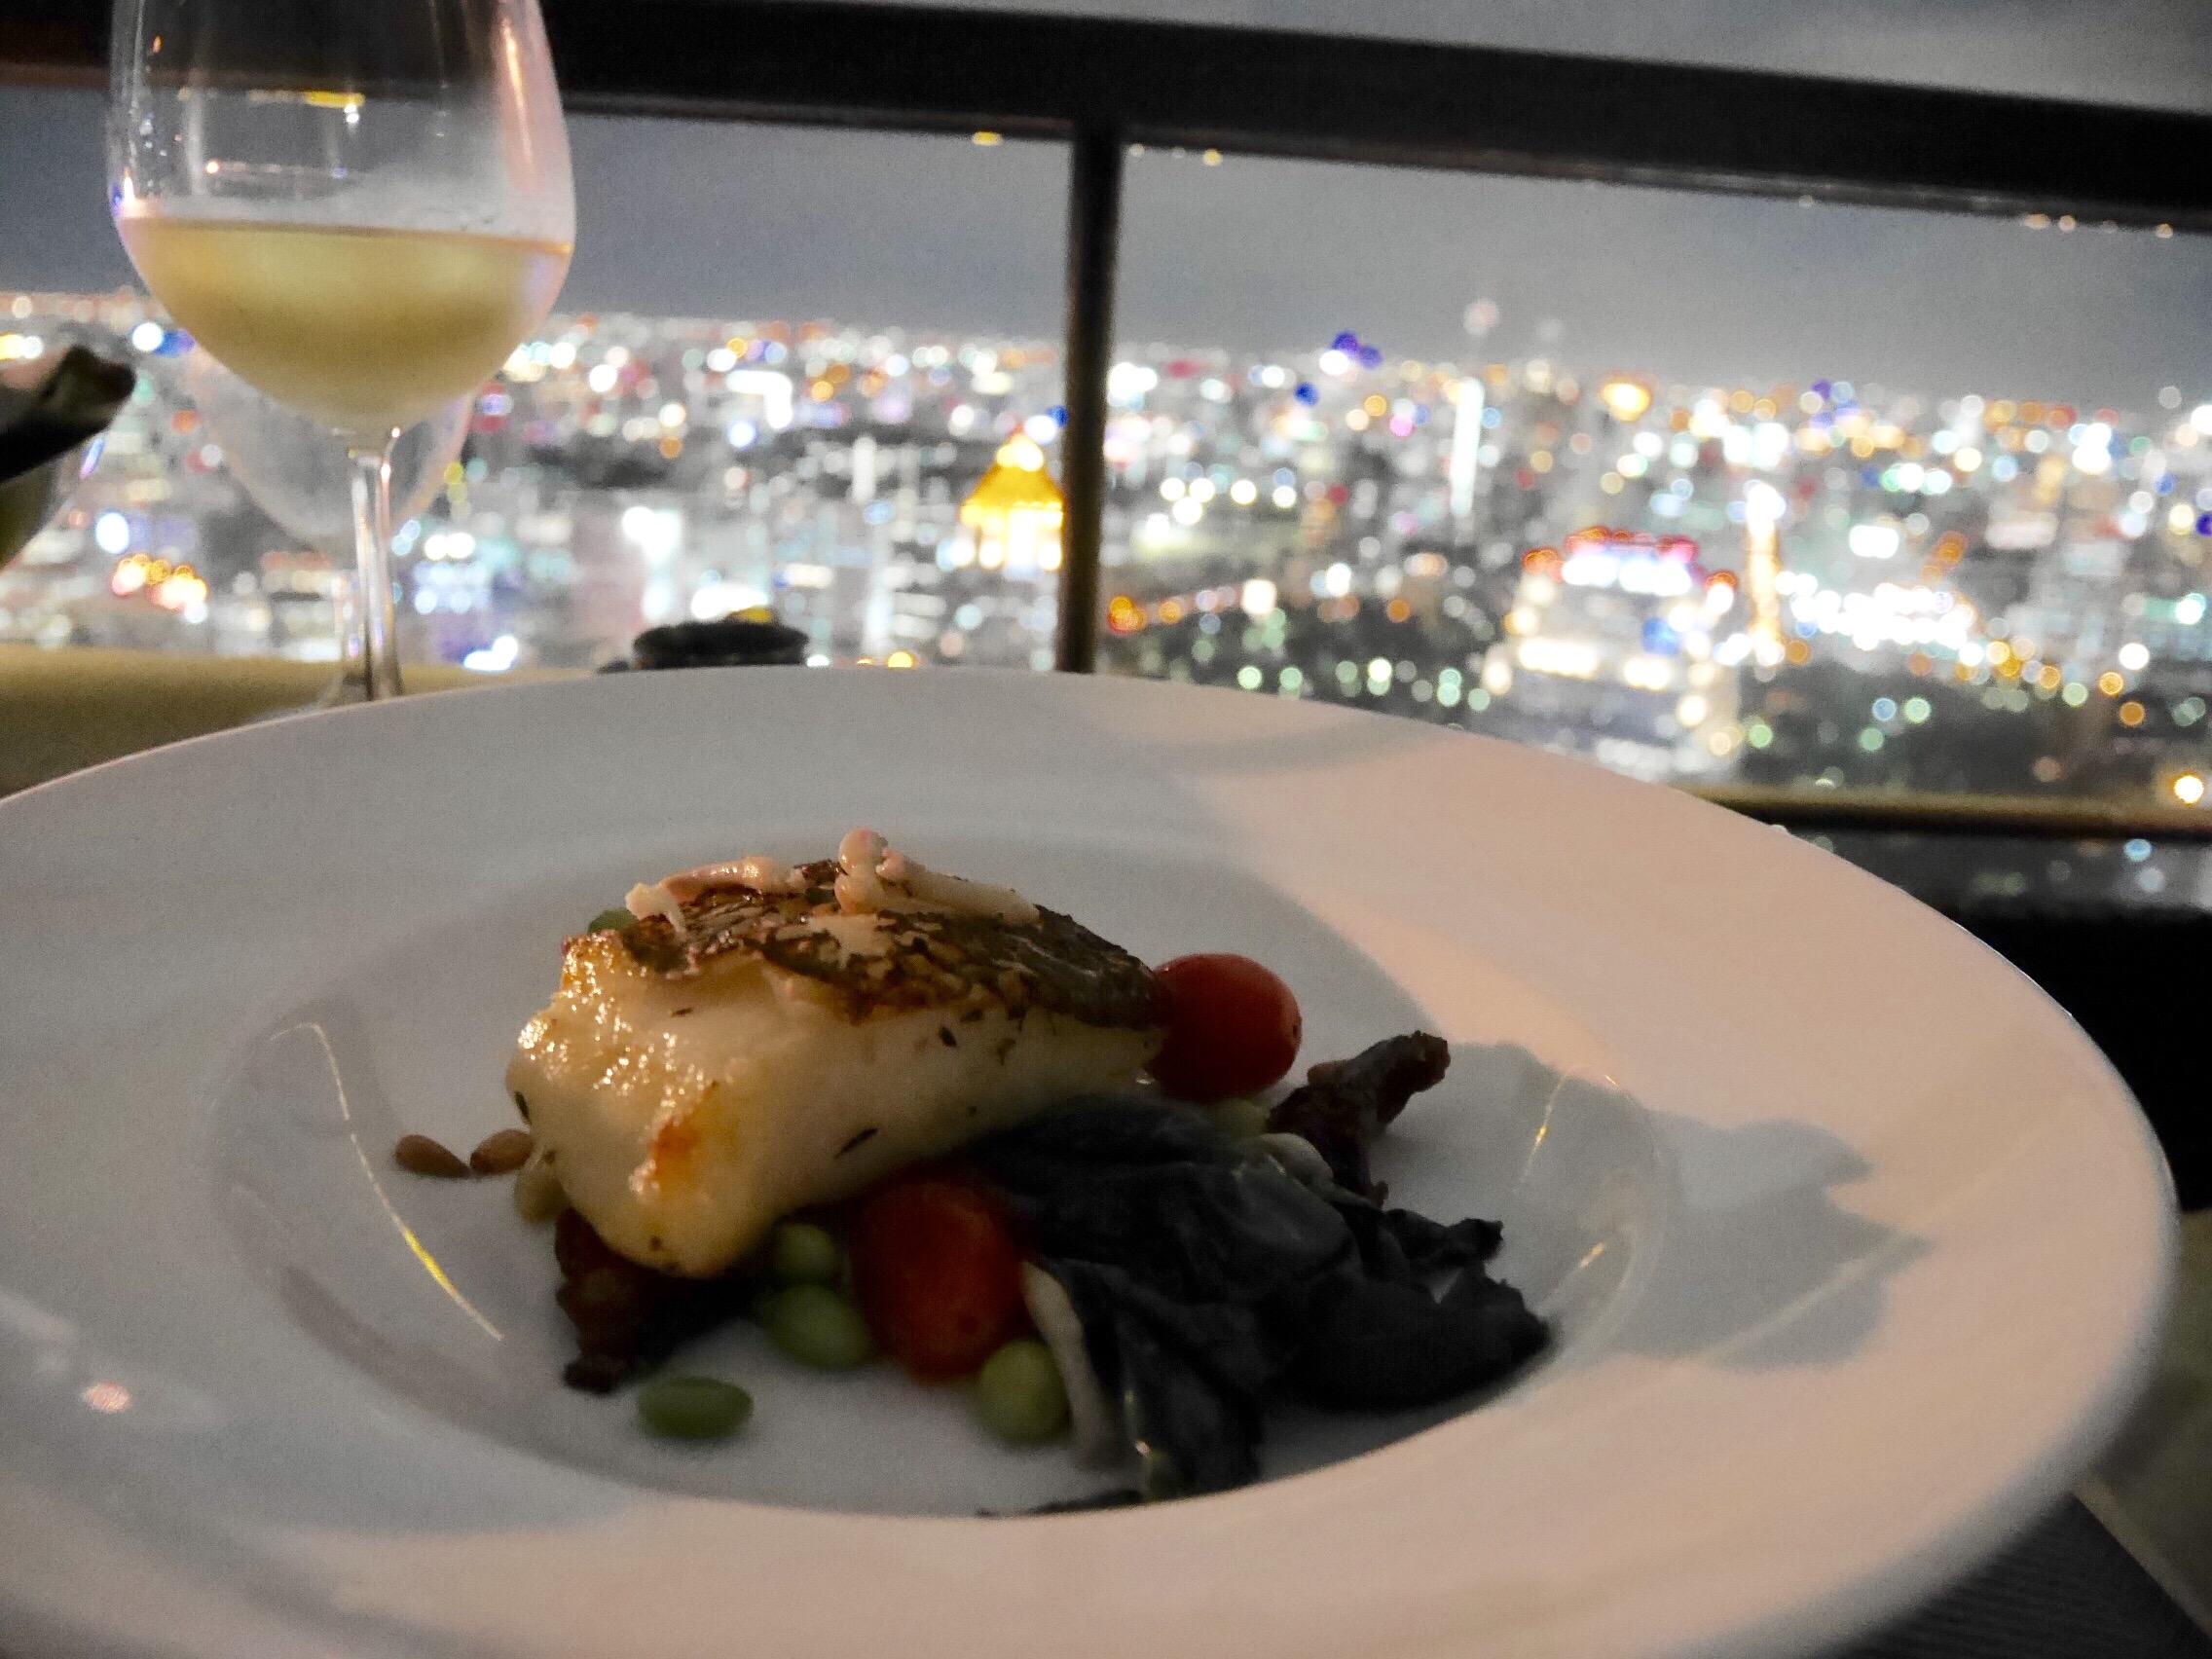 img 8305 - Banyan Tree Bangkok - 61階のルーフトップレストランVertigoで過ごす贅沢ディナータイム